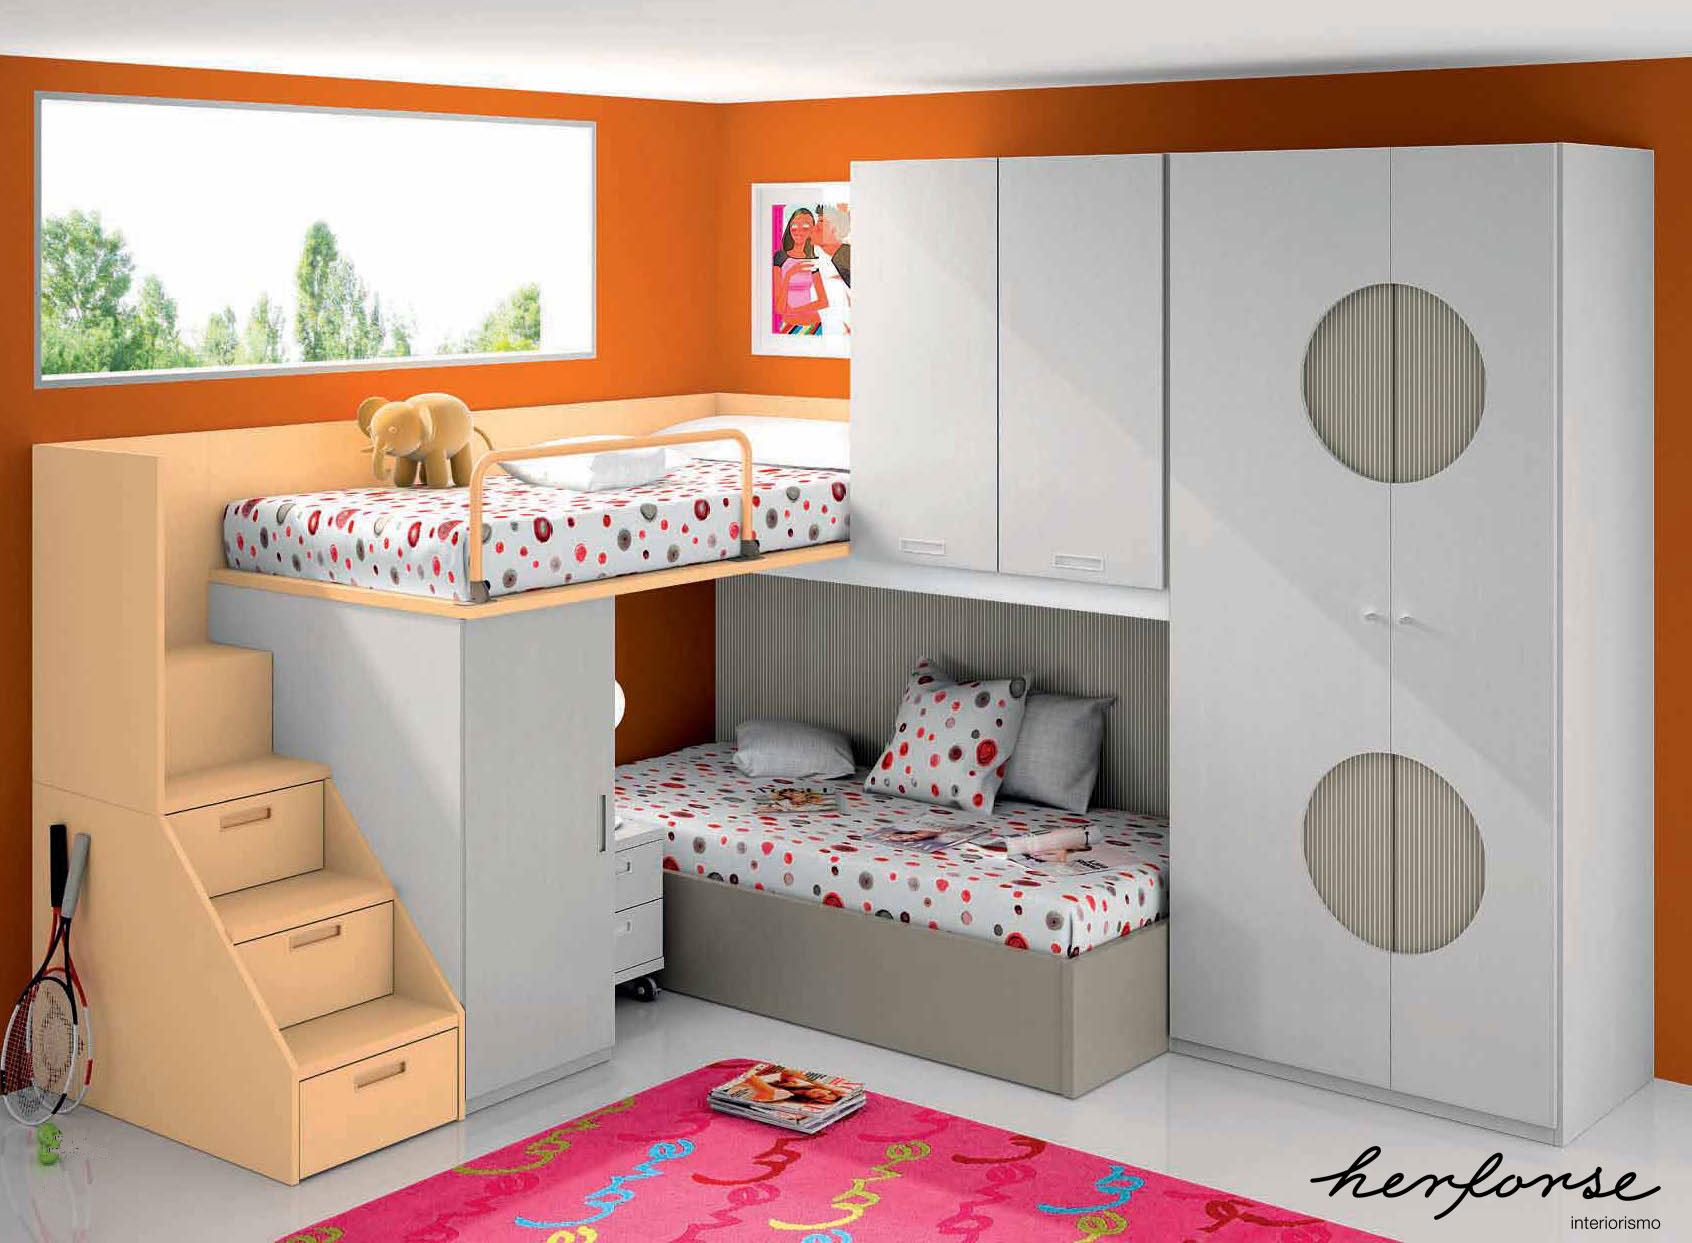 Literas y trenes juveniles herforseinteriorismo for Habitaciones modulares juveniles